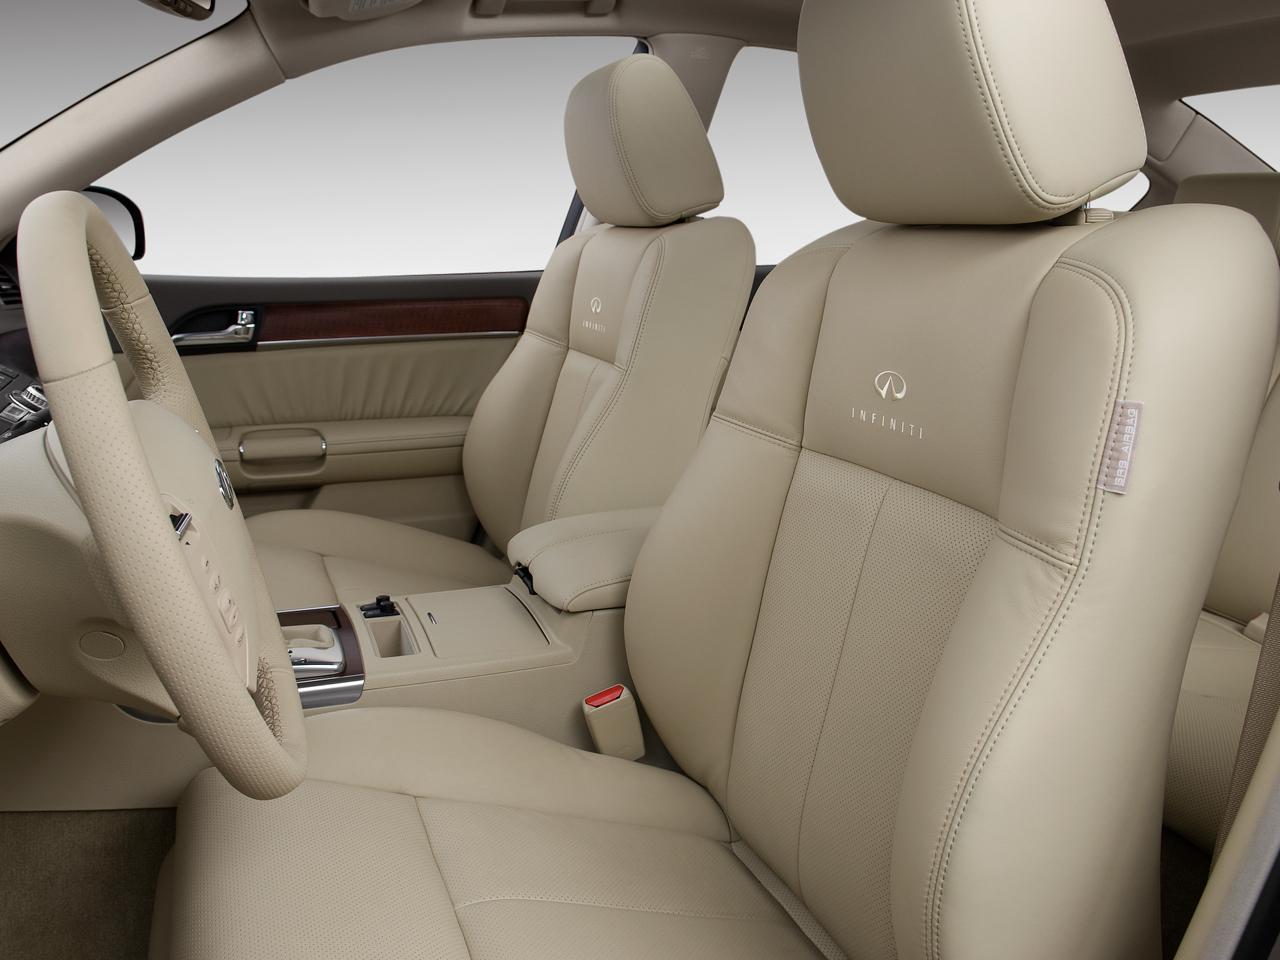 2009 infiniti m m35 m35x m45 m45x midsize sedans 2950 vanachro Gallery